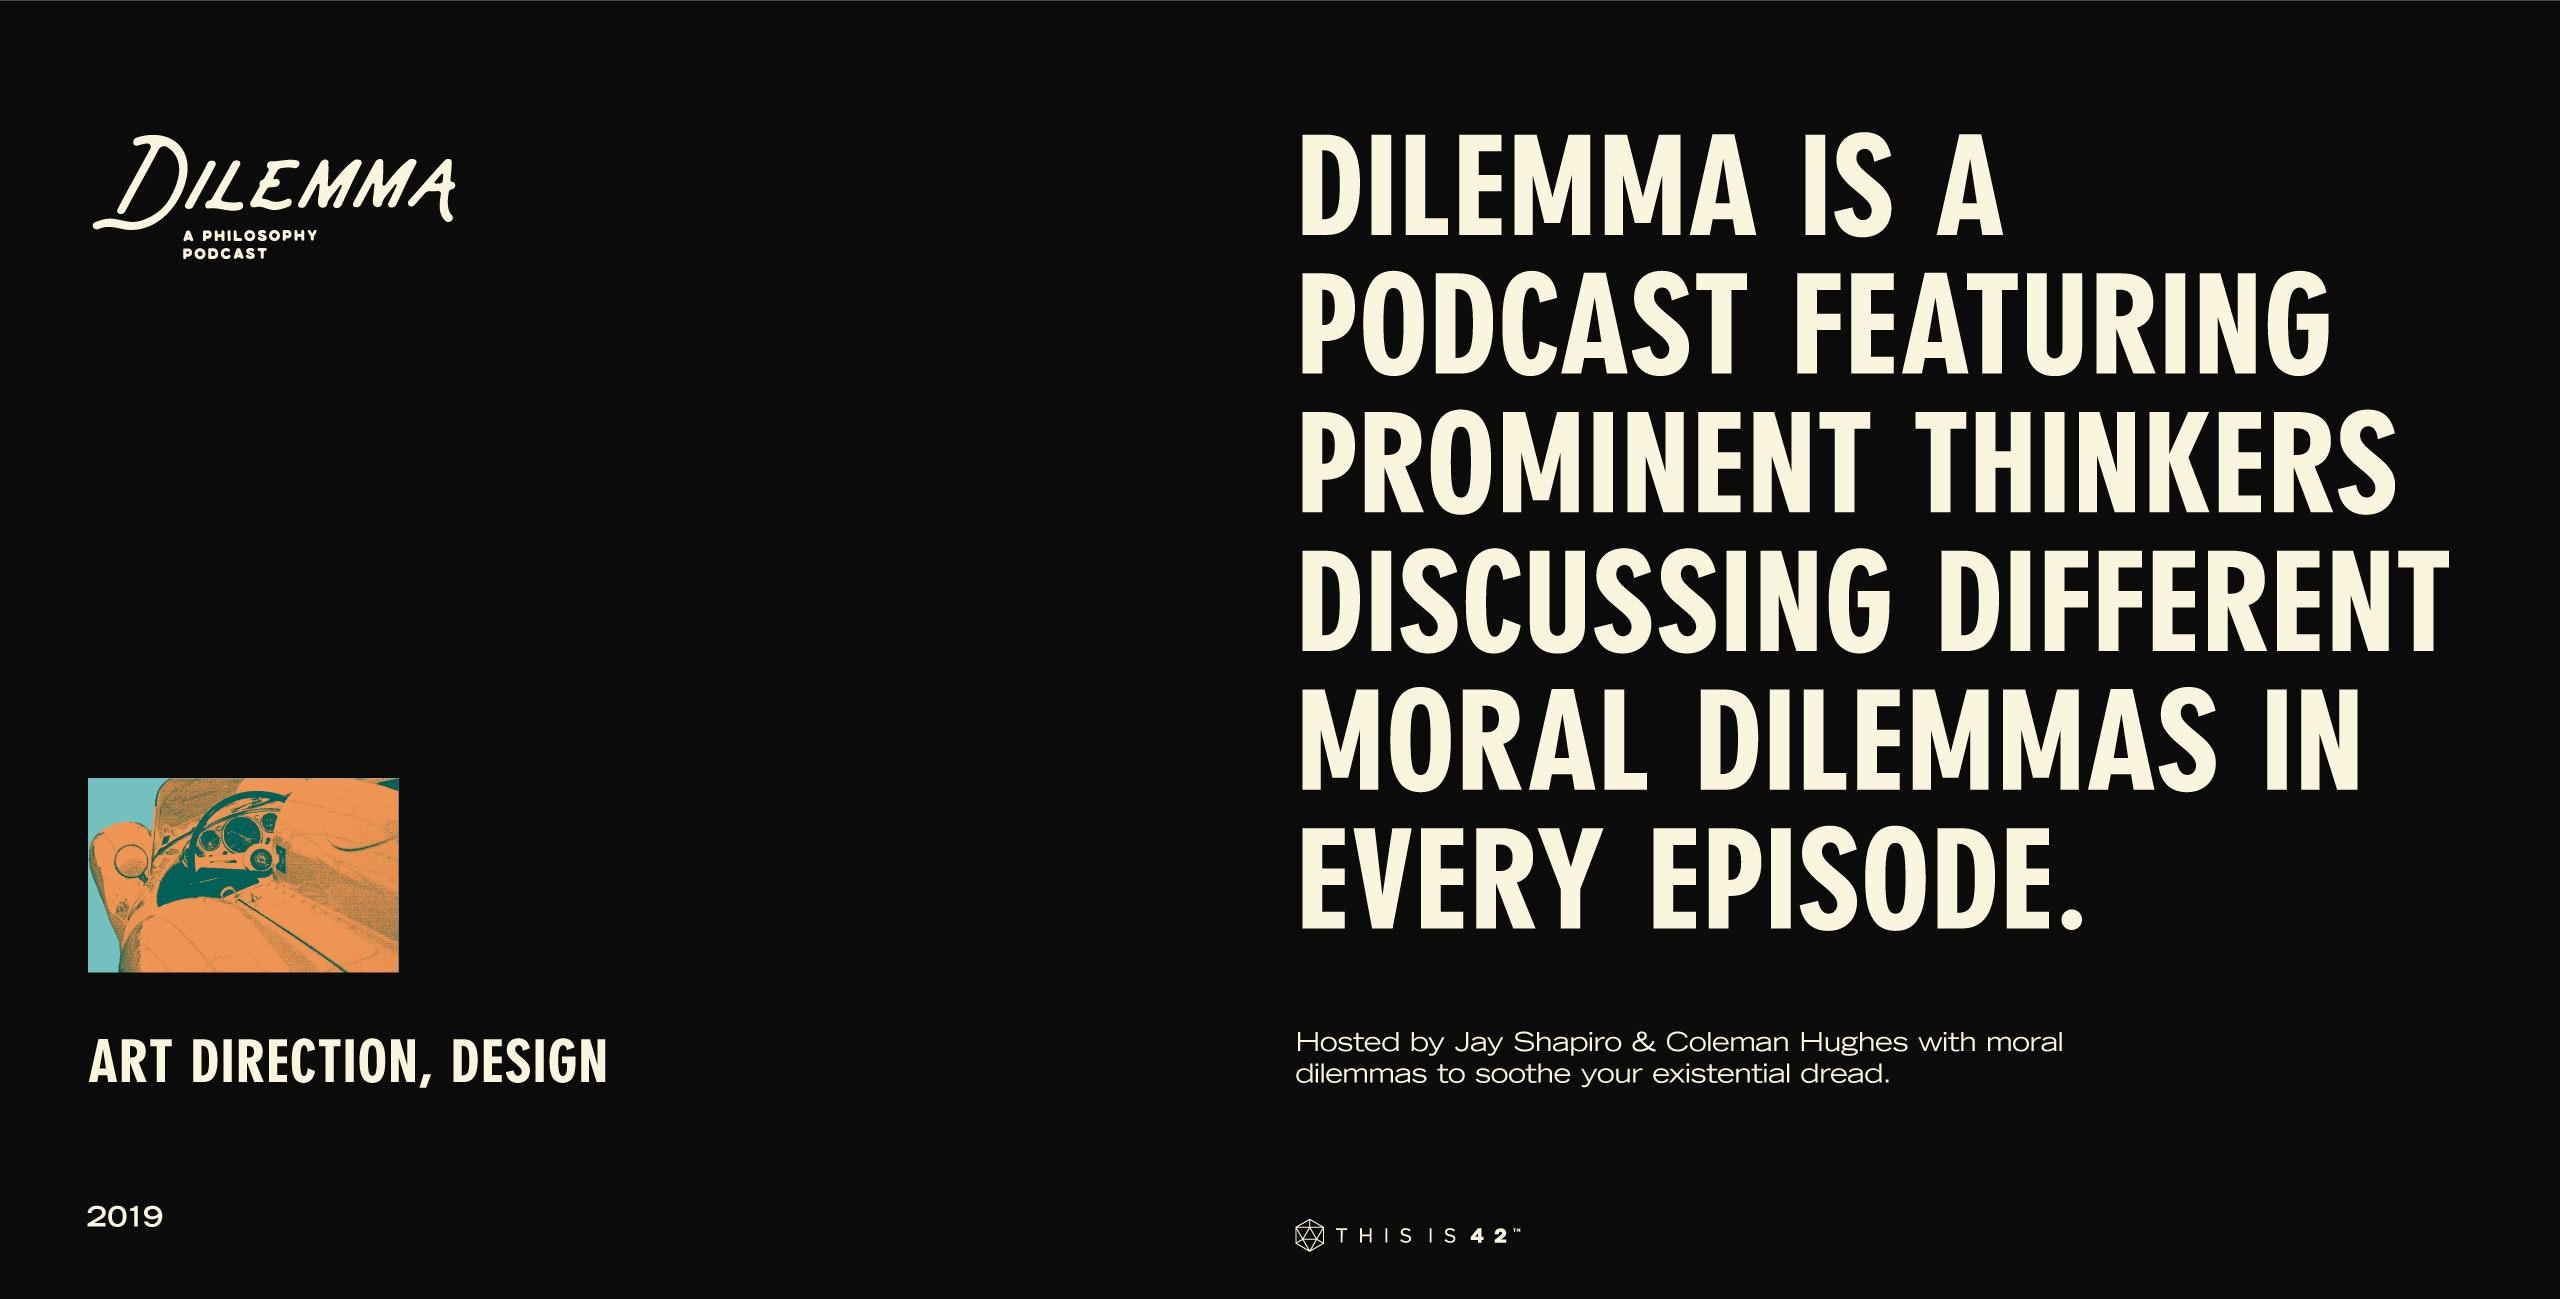 ALDAIN – Content Creator • Design • Sydney - 20_2103_Portfolio_Design_DilemmaPodcast_B